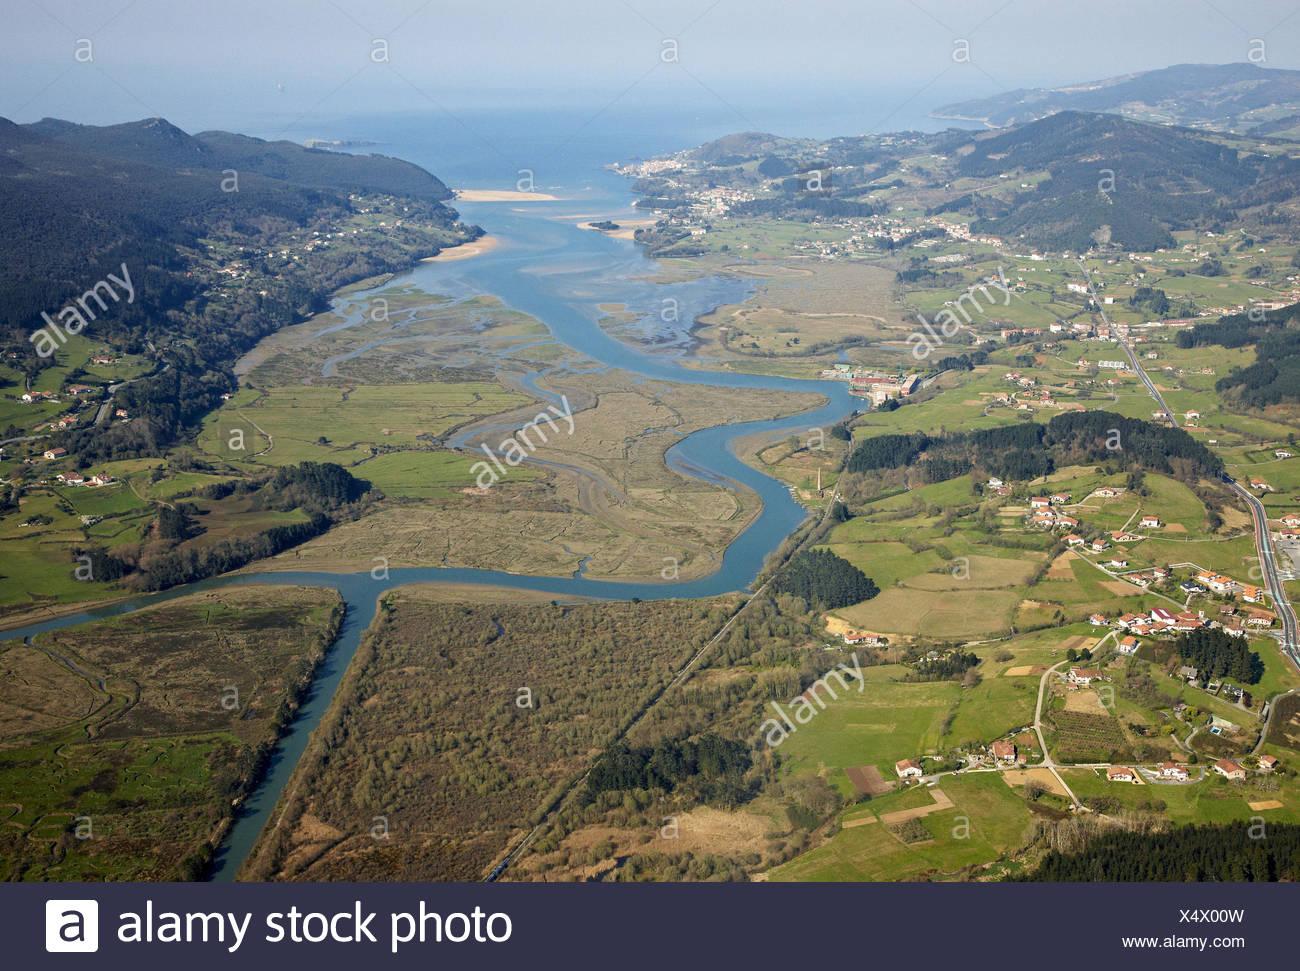 Urdaibai Biosphären Reservat, Biskaya, Baskenland, Spanien Stockbild